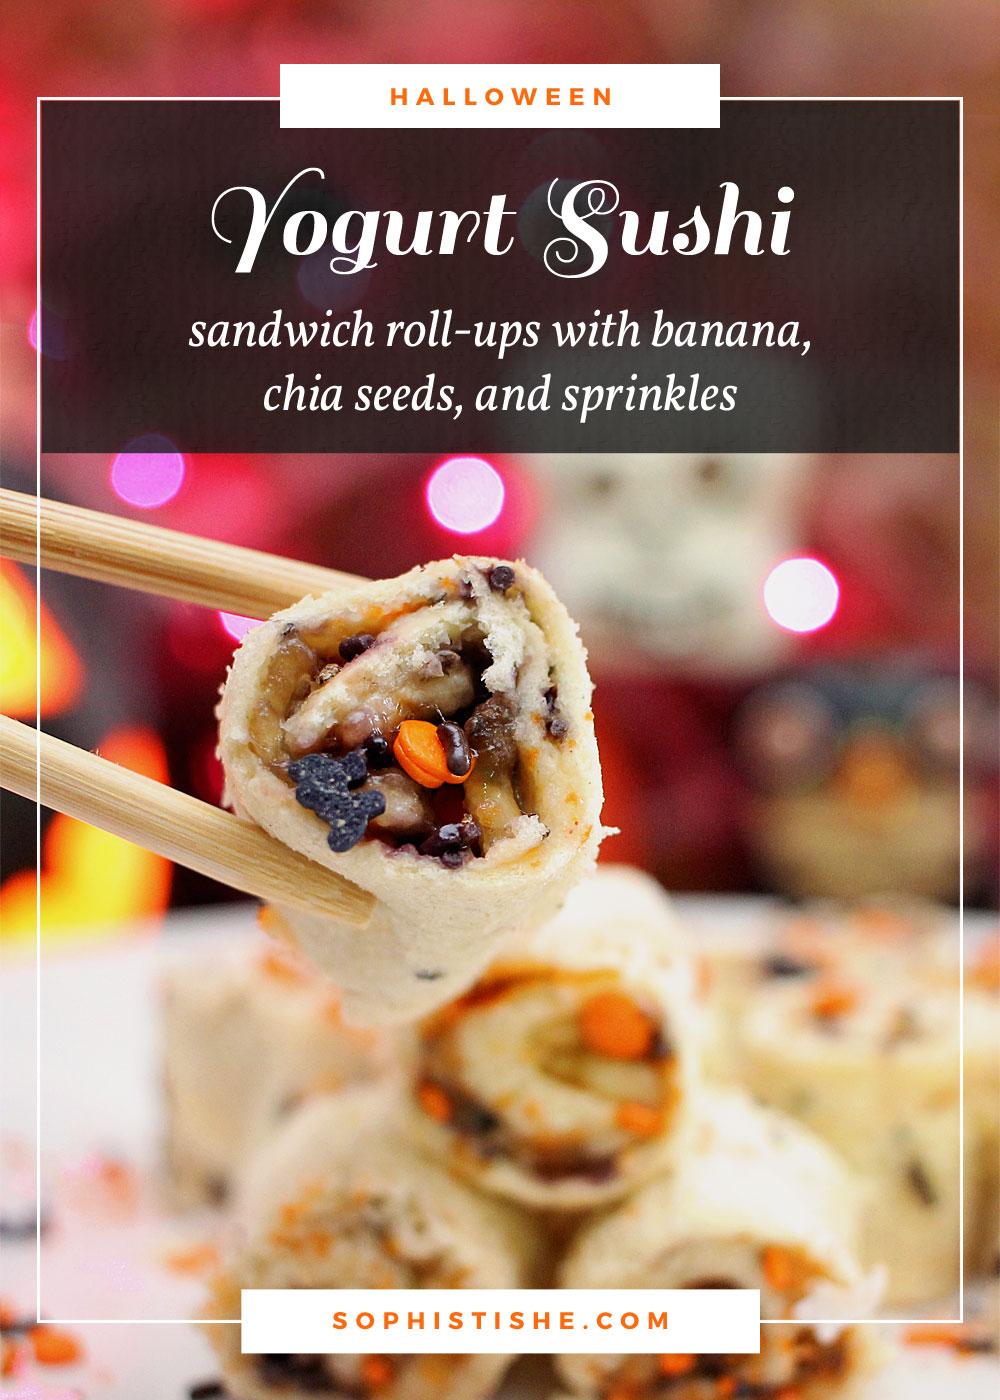 Yogurt Sushi Sandwich Roll-ups